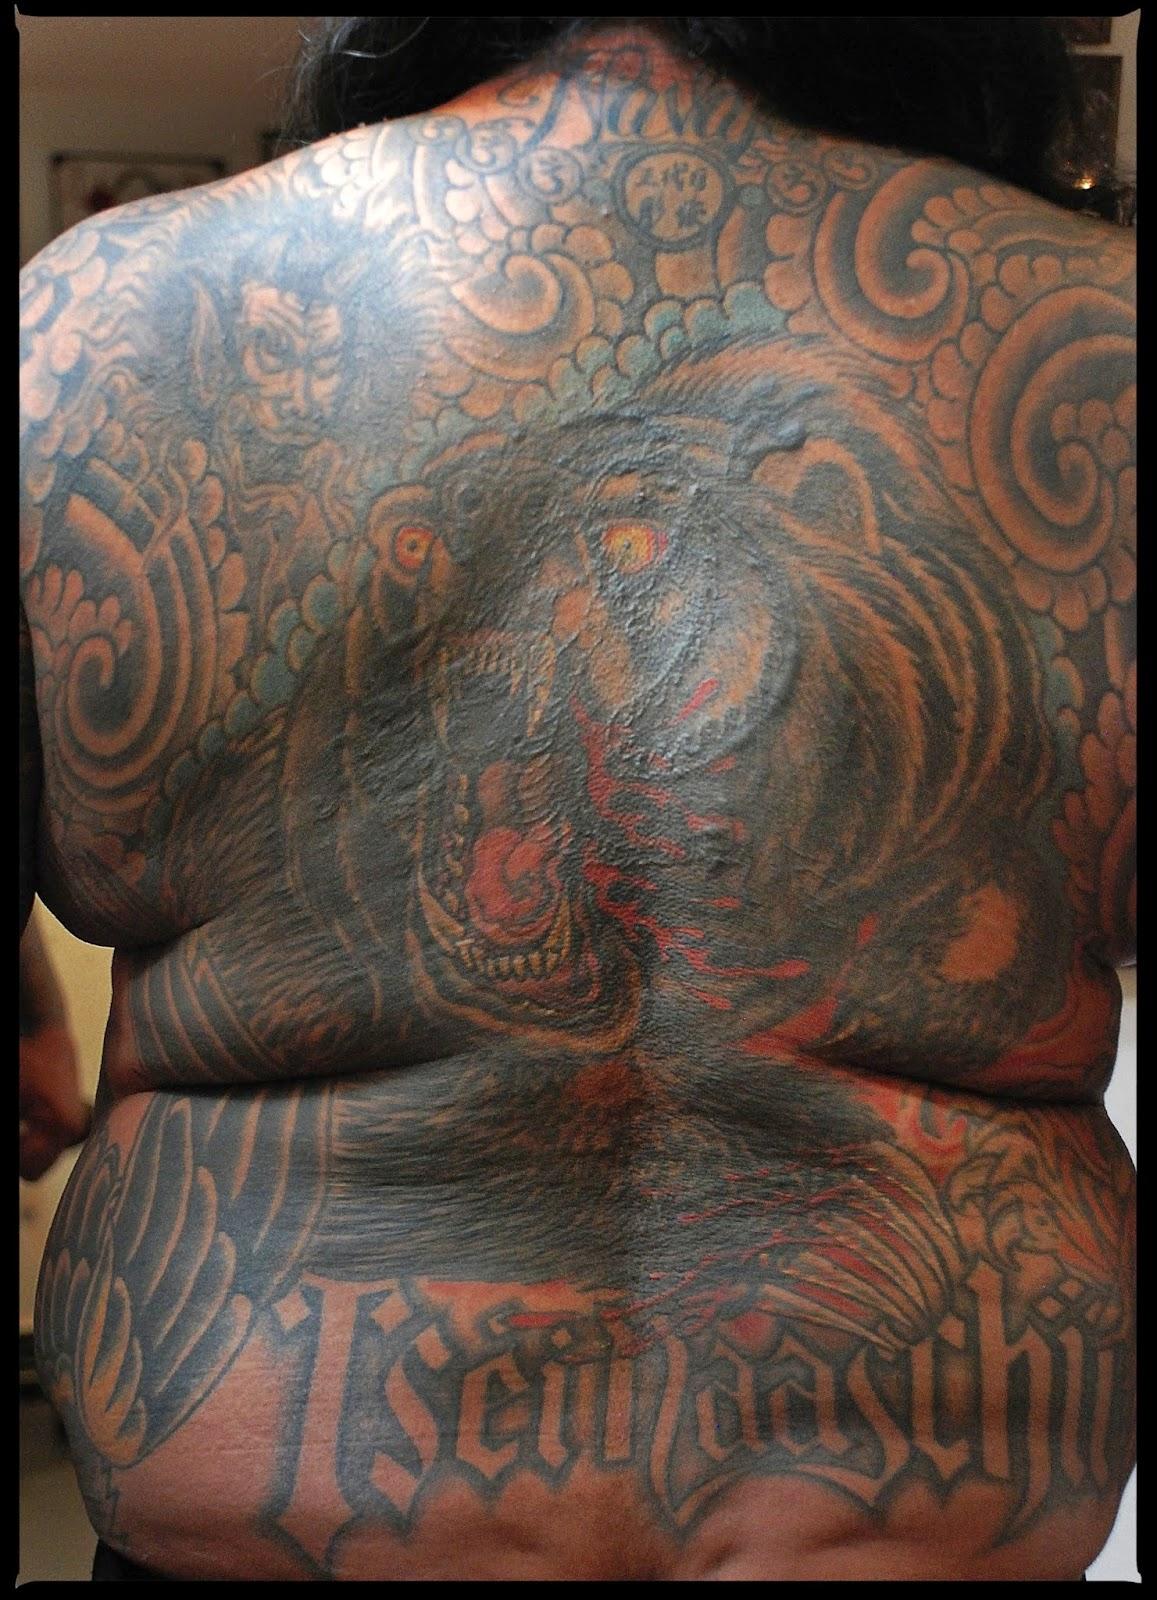 tattoo world running bear tattooing navajo rh irezumironin blogspot com Navajo Symbols navajo indian tribal tattoos